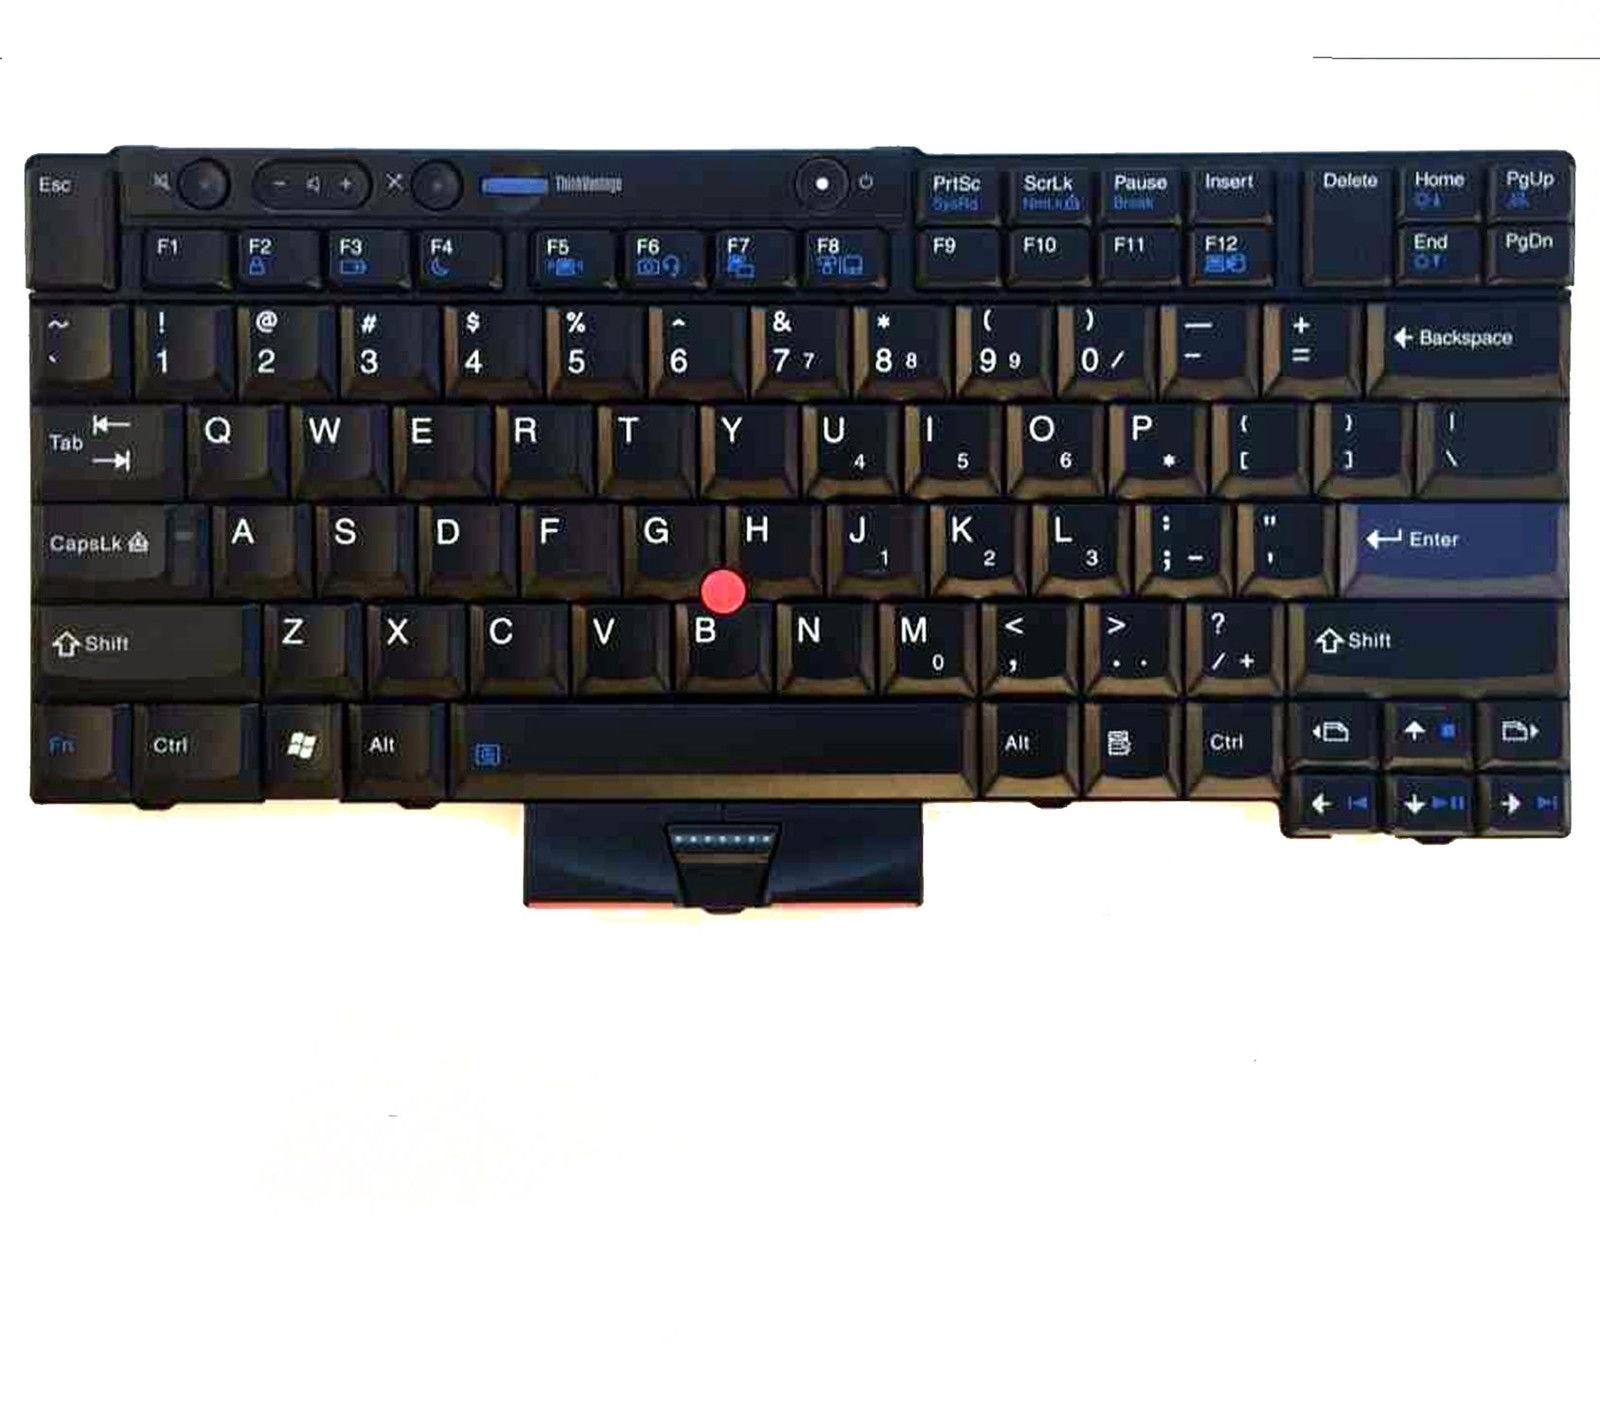 NEW Laptop Keyboard For Lenovo Thinkpad T410 T410I T410SI T420 T420I T420S T510 T510I new laptop keyboard for lenovo thinkpad t410 t420 x220 t510 t510i t520 t520i w510 w520 series laptop keyboard us layout